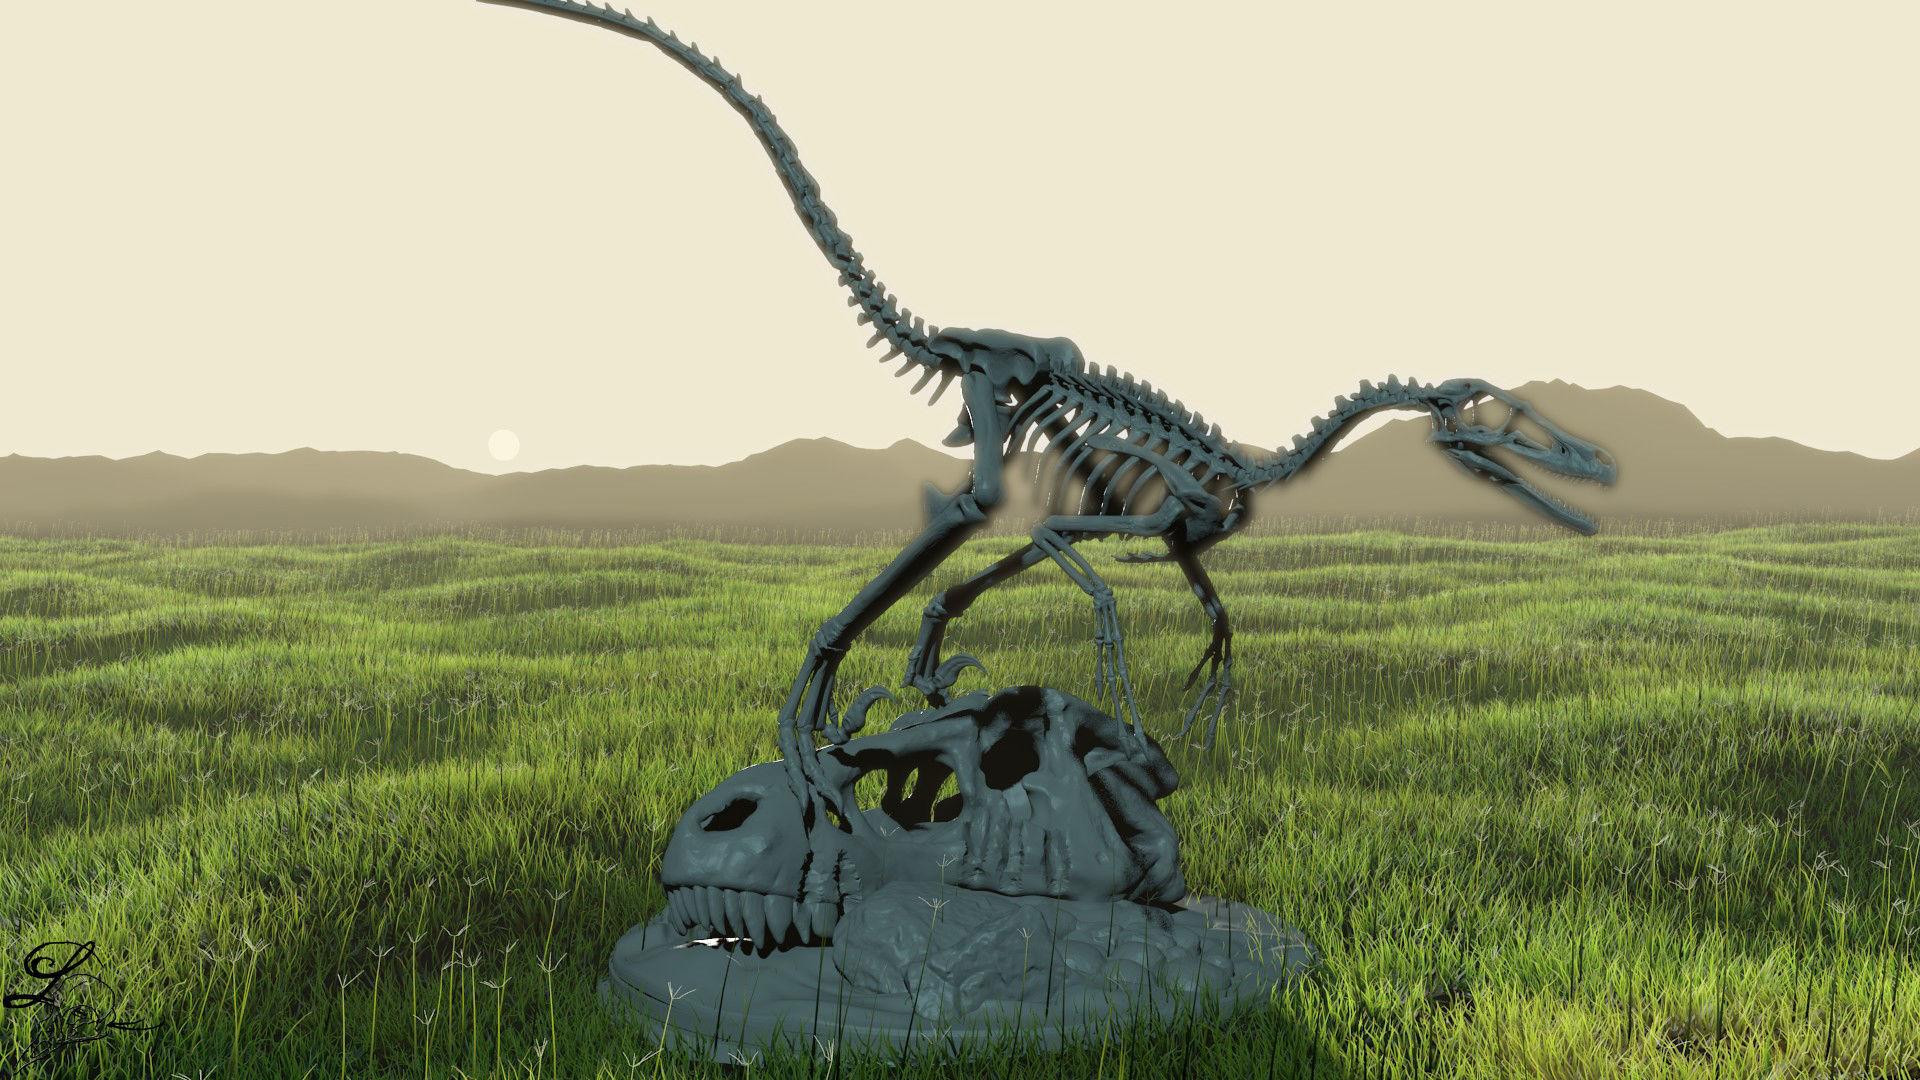 Velociraptor Skeleton Diorama with T-Rex